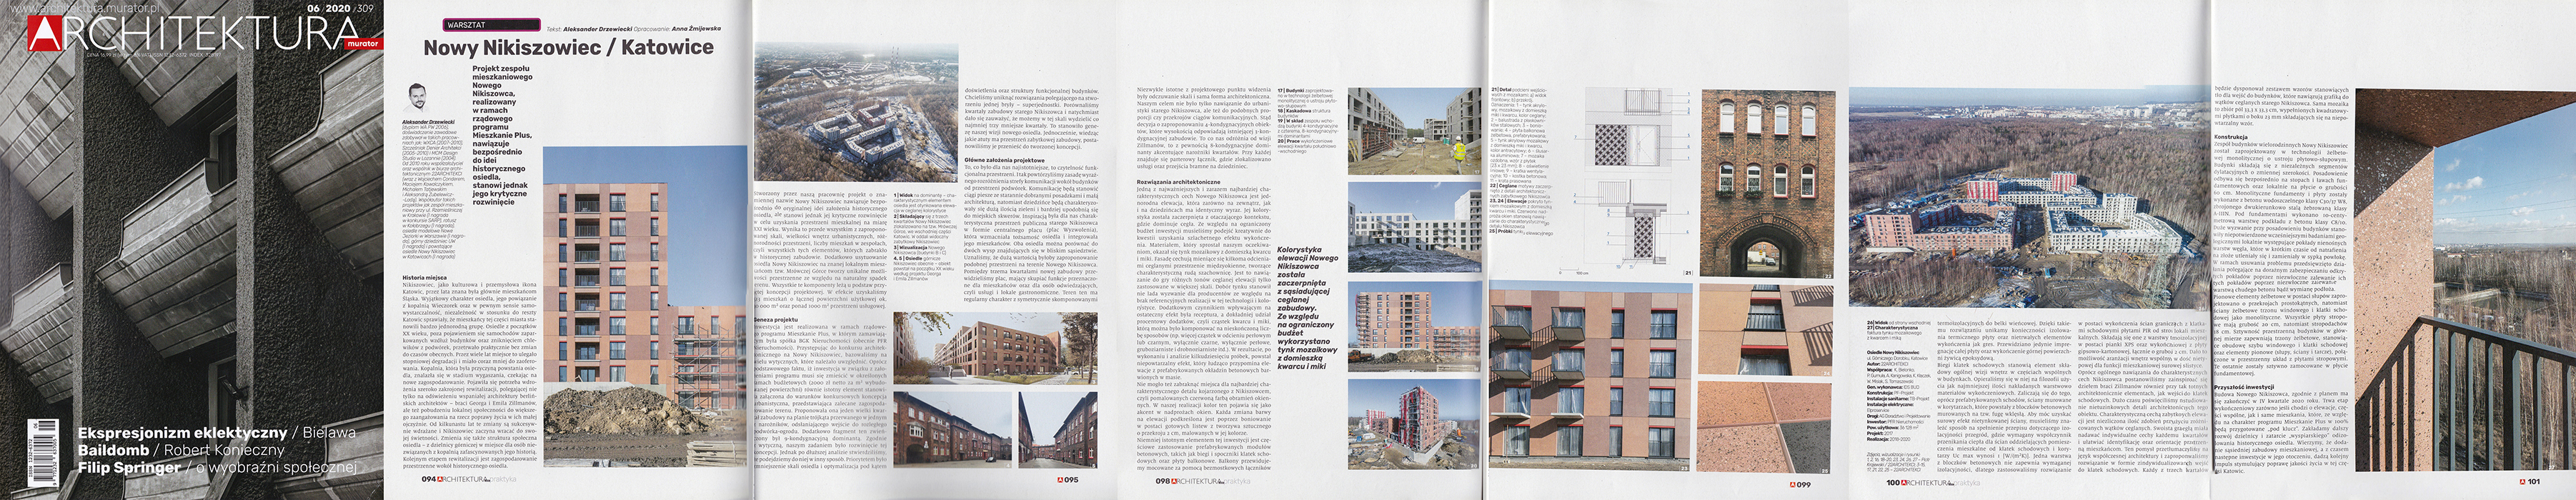 Nowy Nikiszowiec housing estate in Katowice - Architektura Murator 06/2020